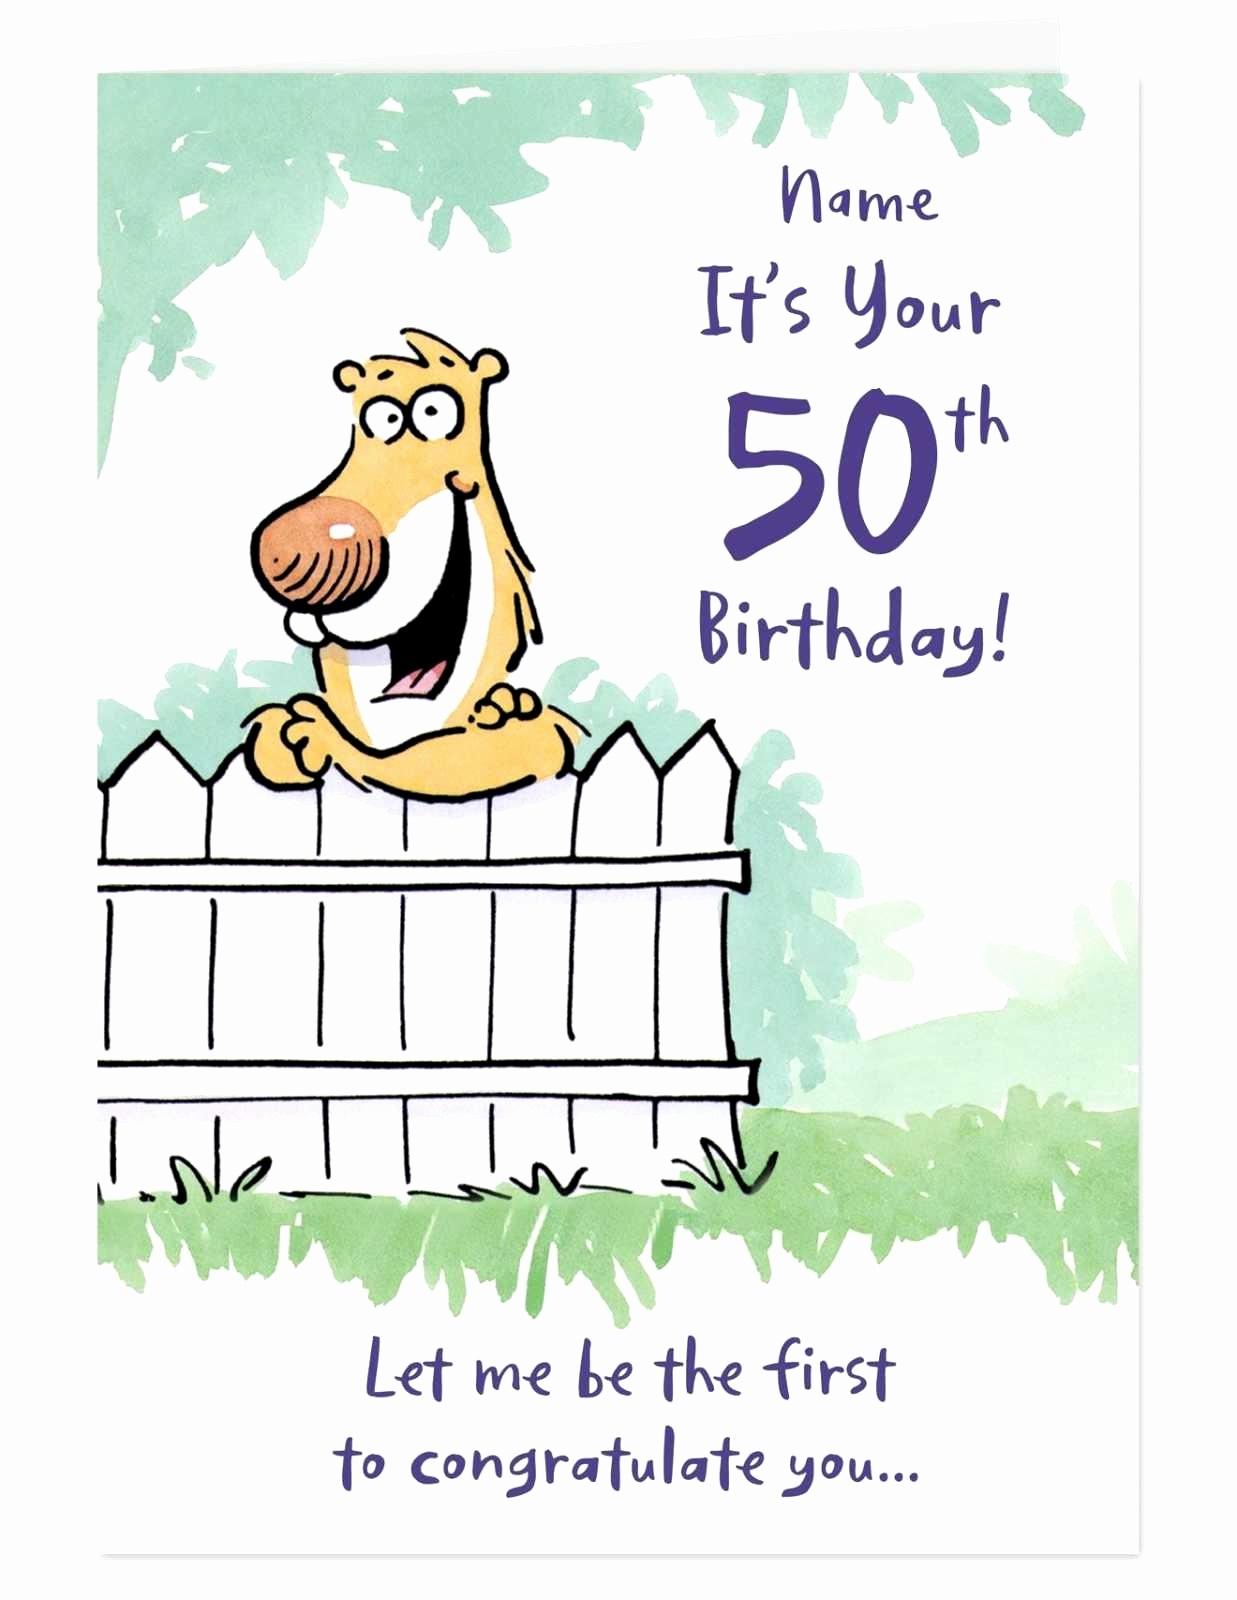 93+ Free Birthday Ecards For Boss - Birthday Cards For My Boss - Free Printable Funny Boss Day Cards